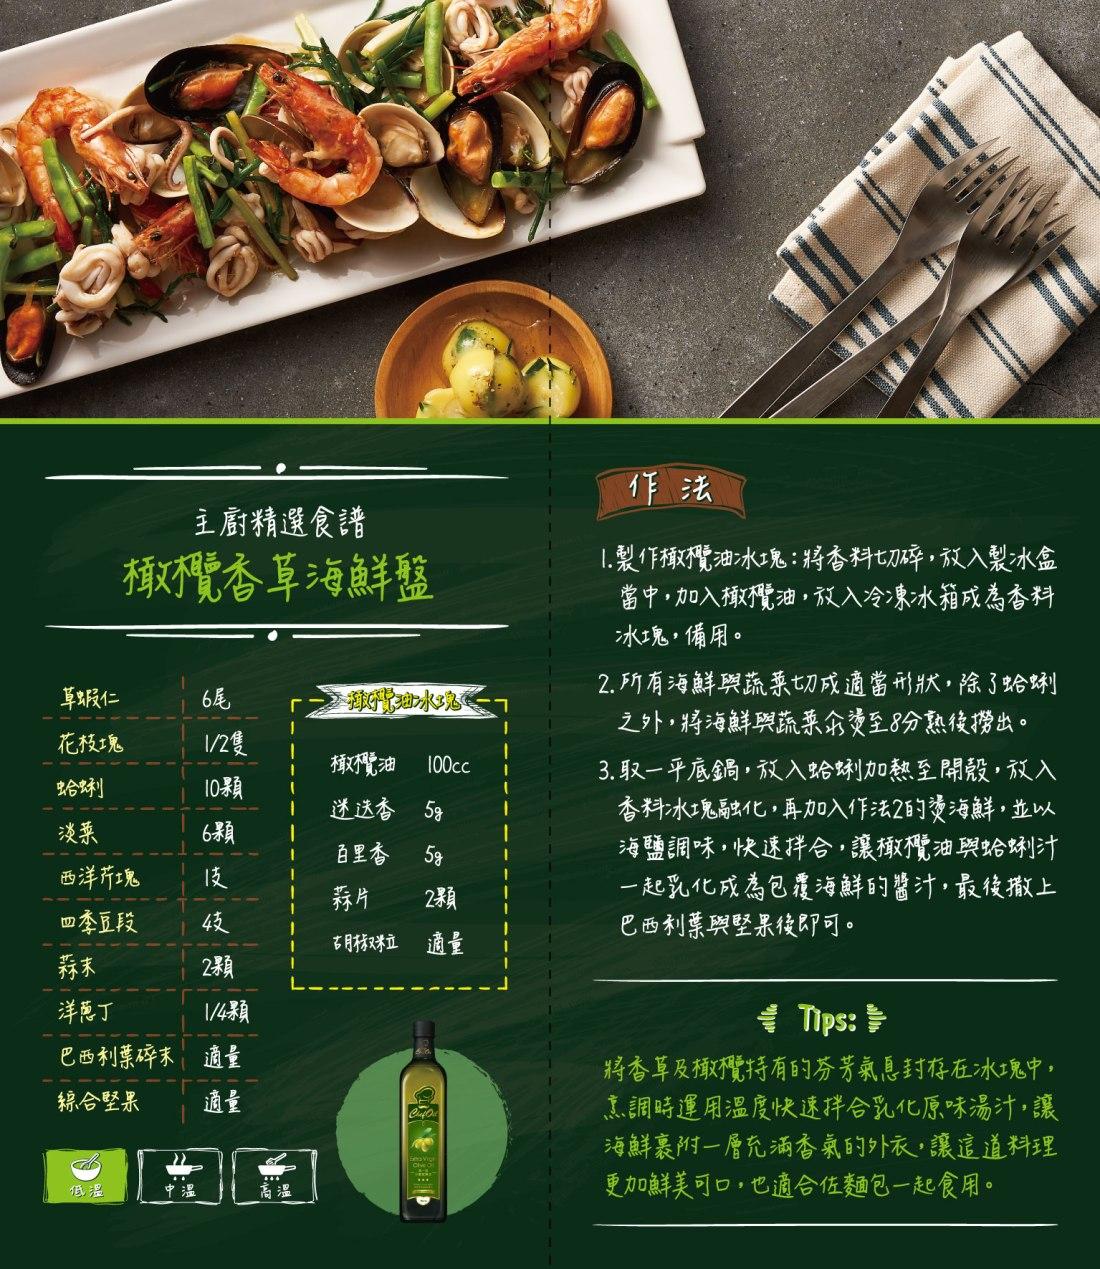 Taisun_主廚精選_Brochure設計(750-1000ml)_P08-09_20170606_1.jpg